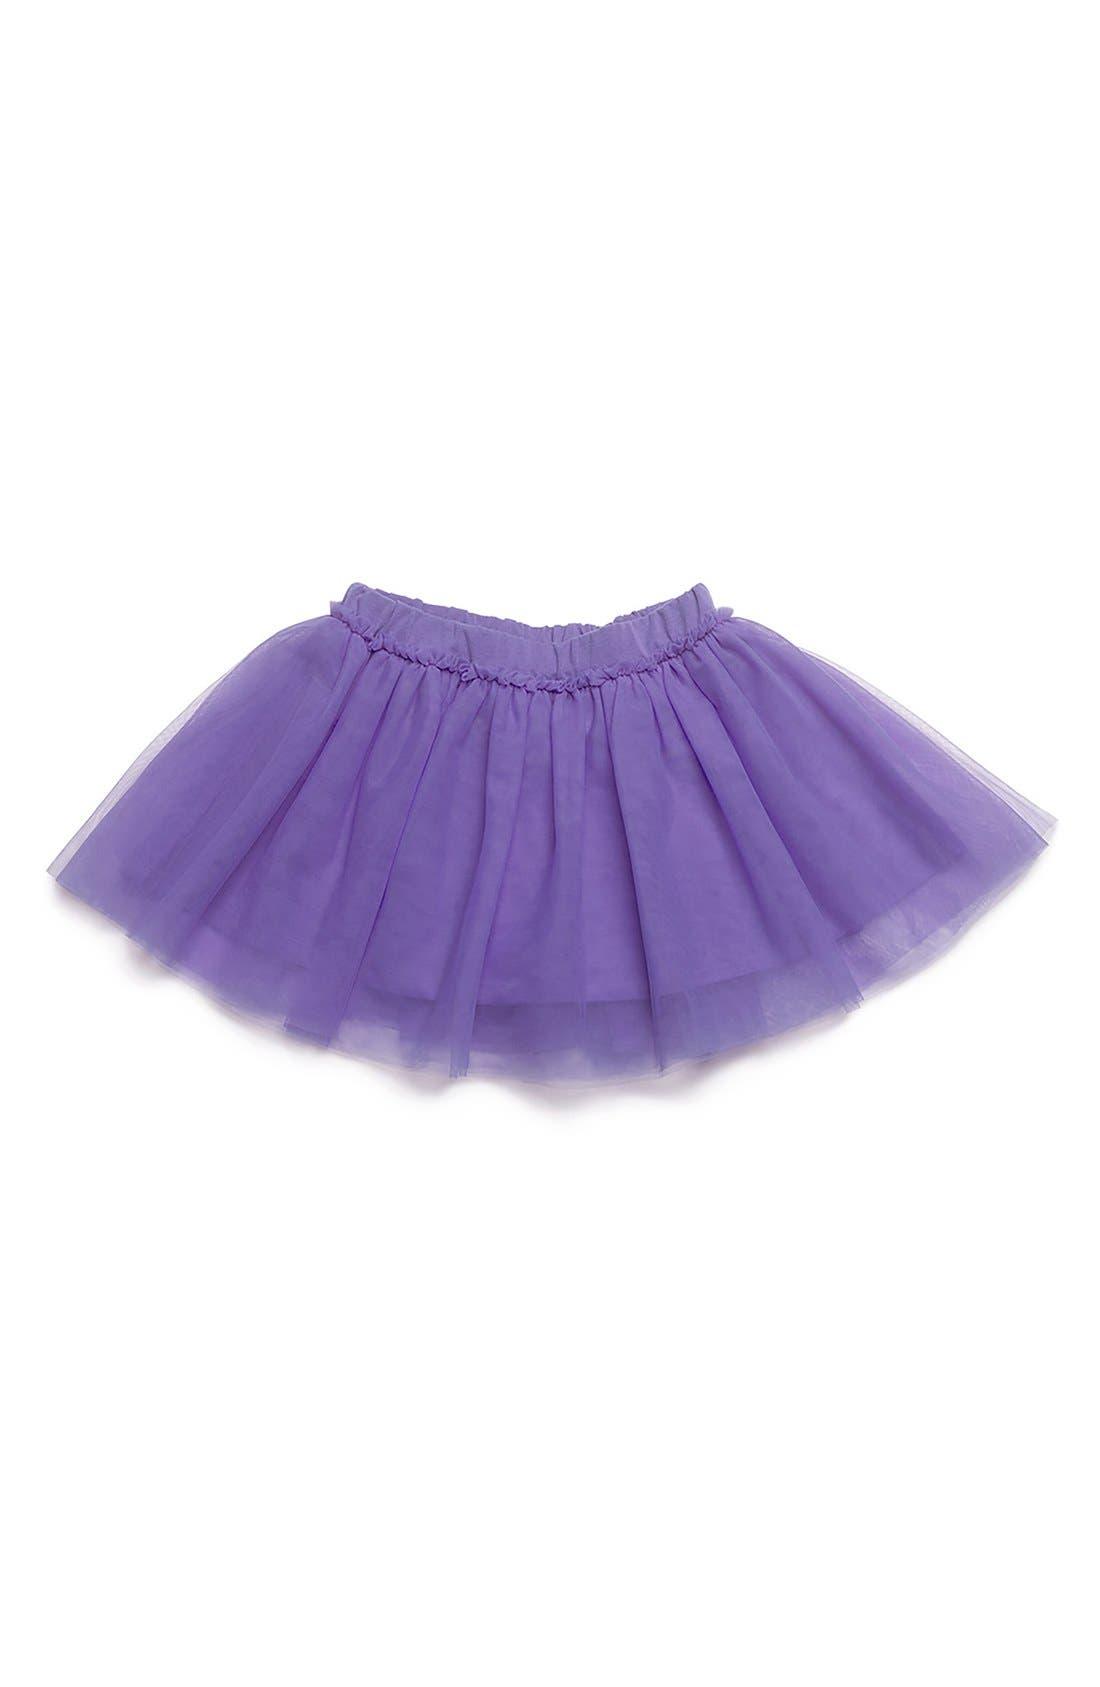 Spinning Skirt,                             Main thumbnail 1, color,                             500